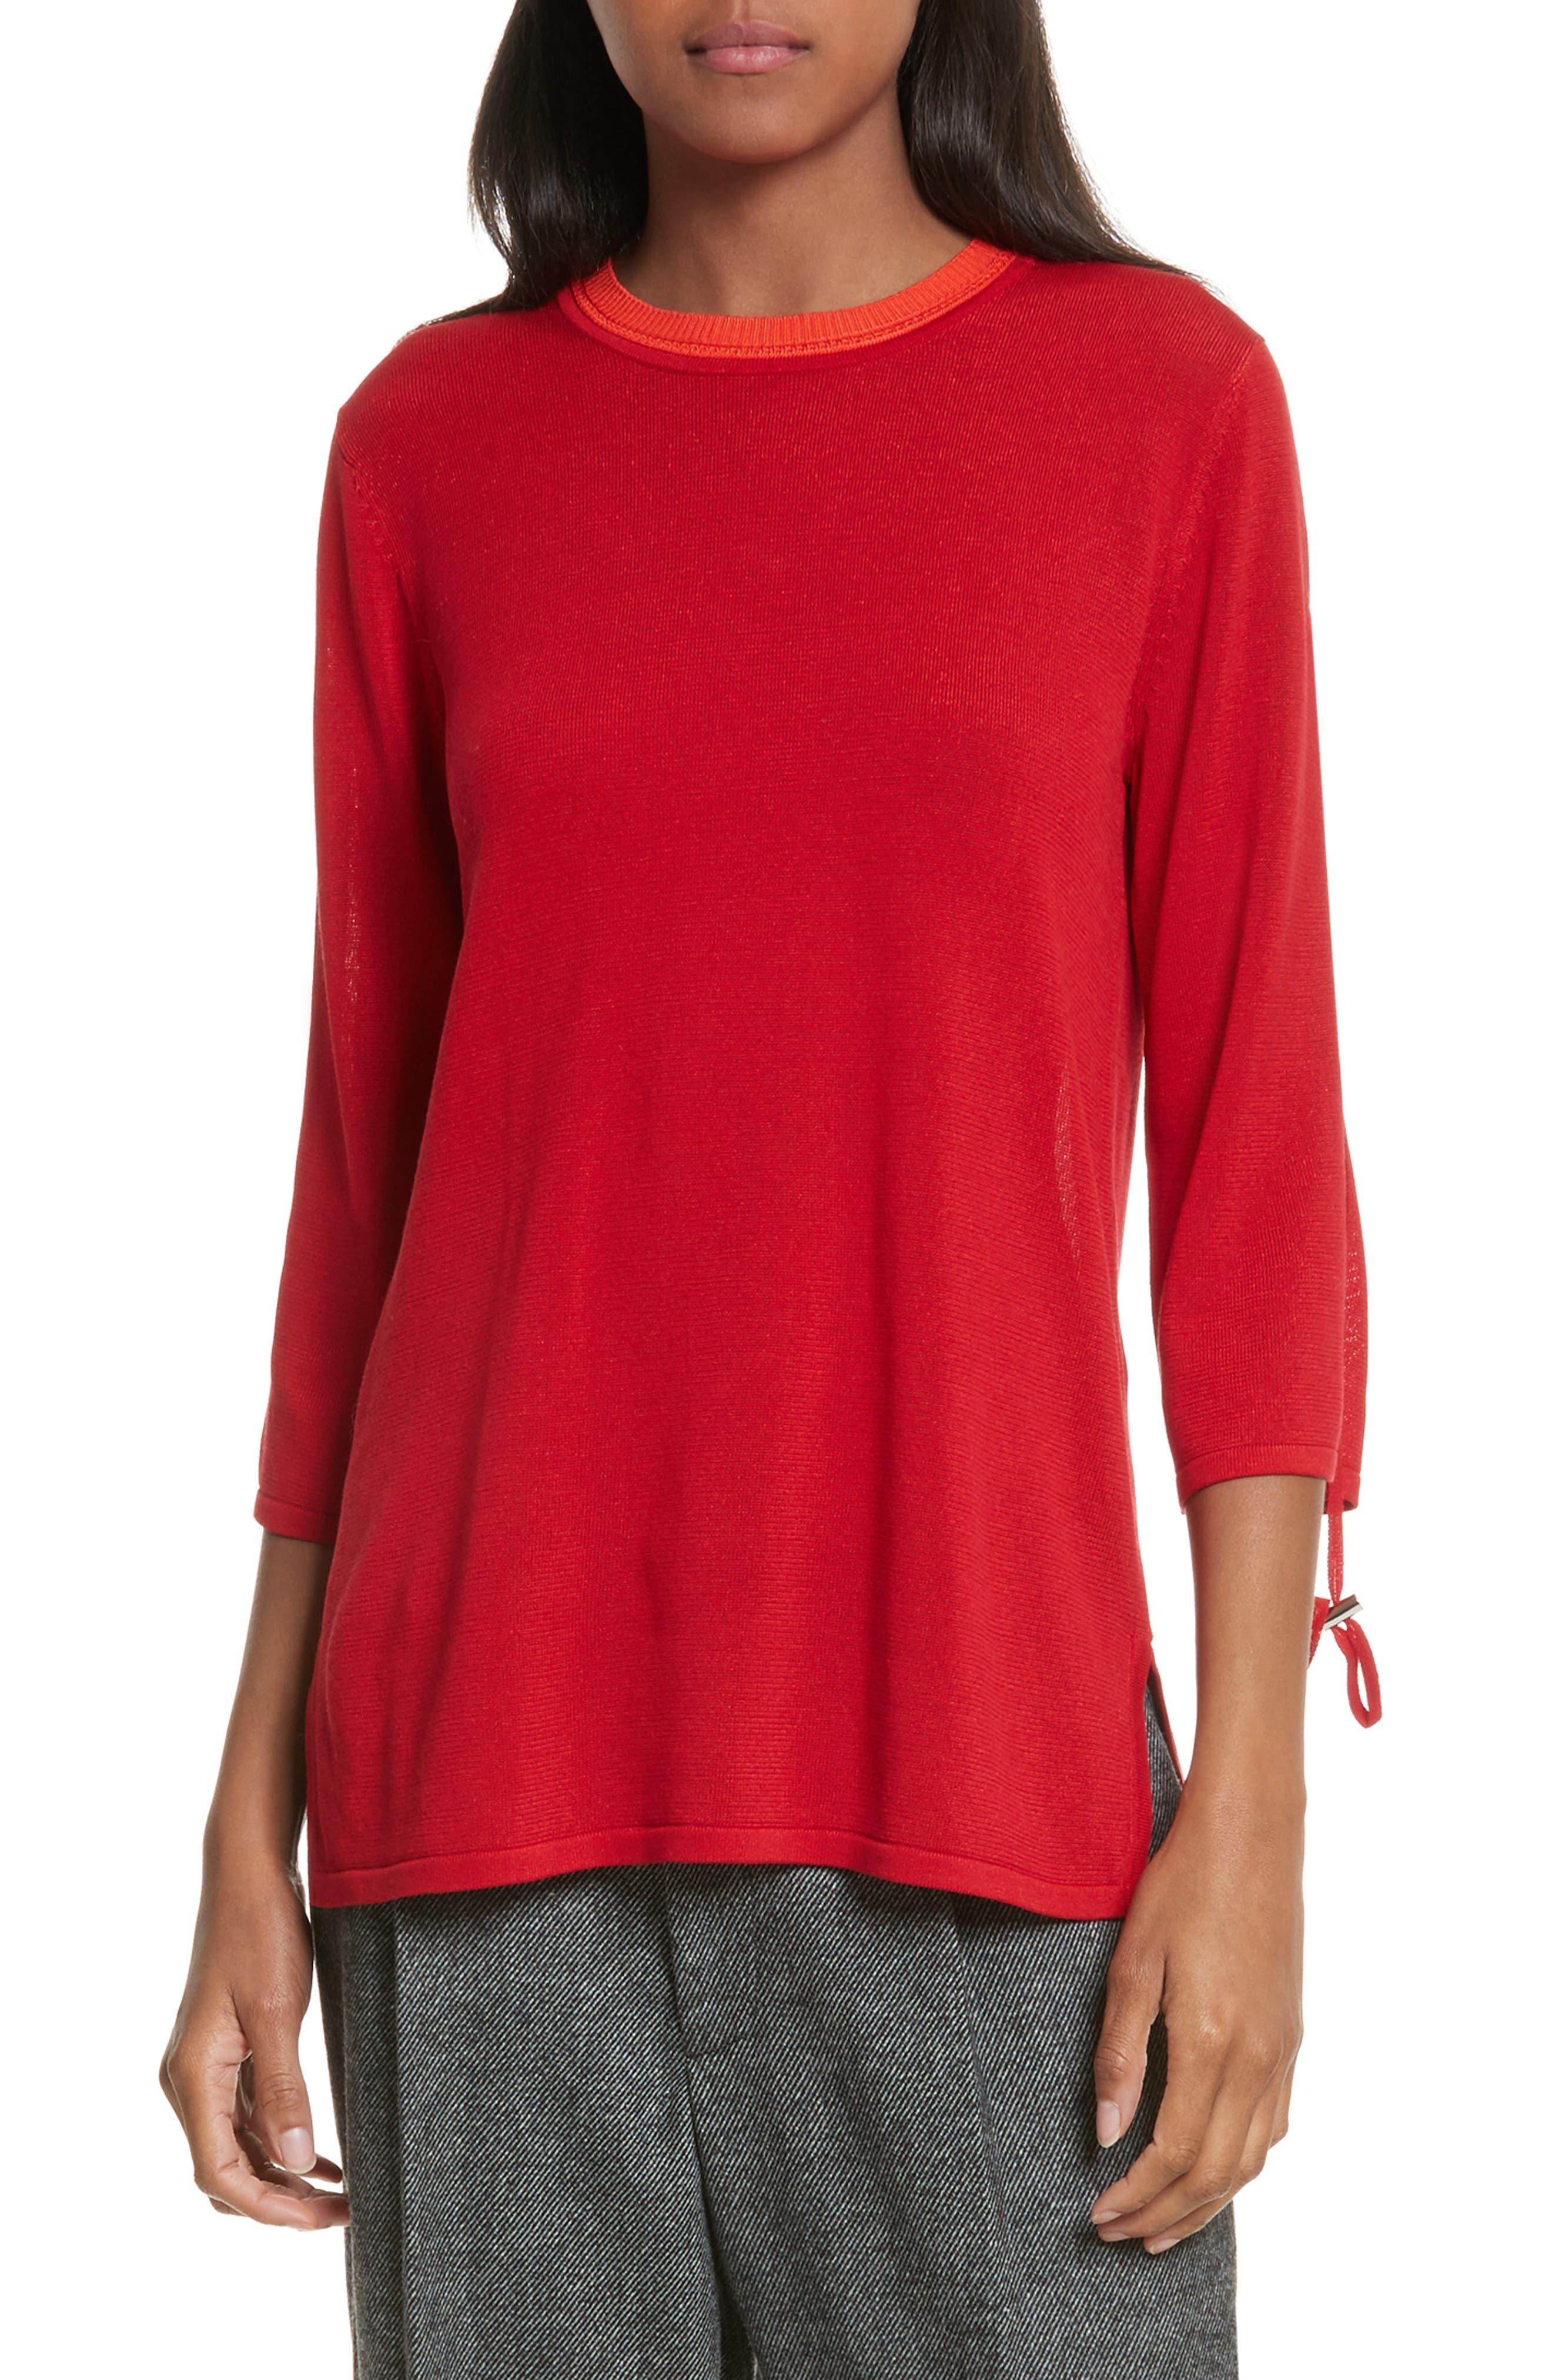 GREY Jason Wu Ruched Sleeve Sweater